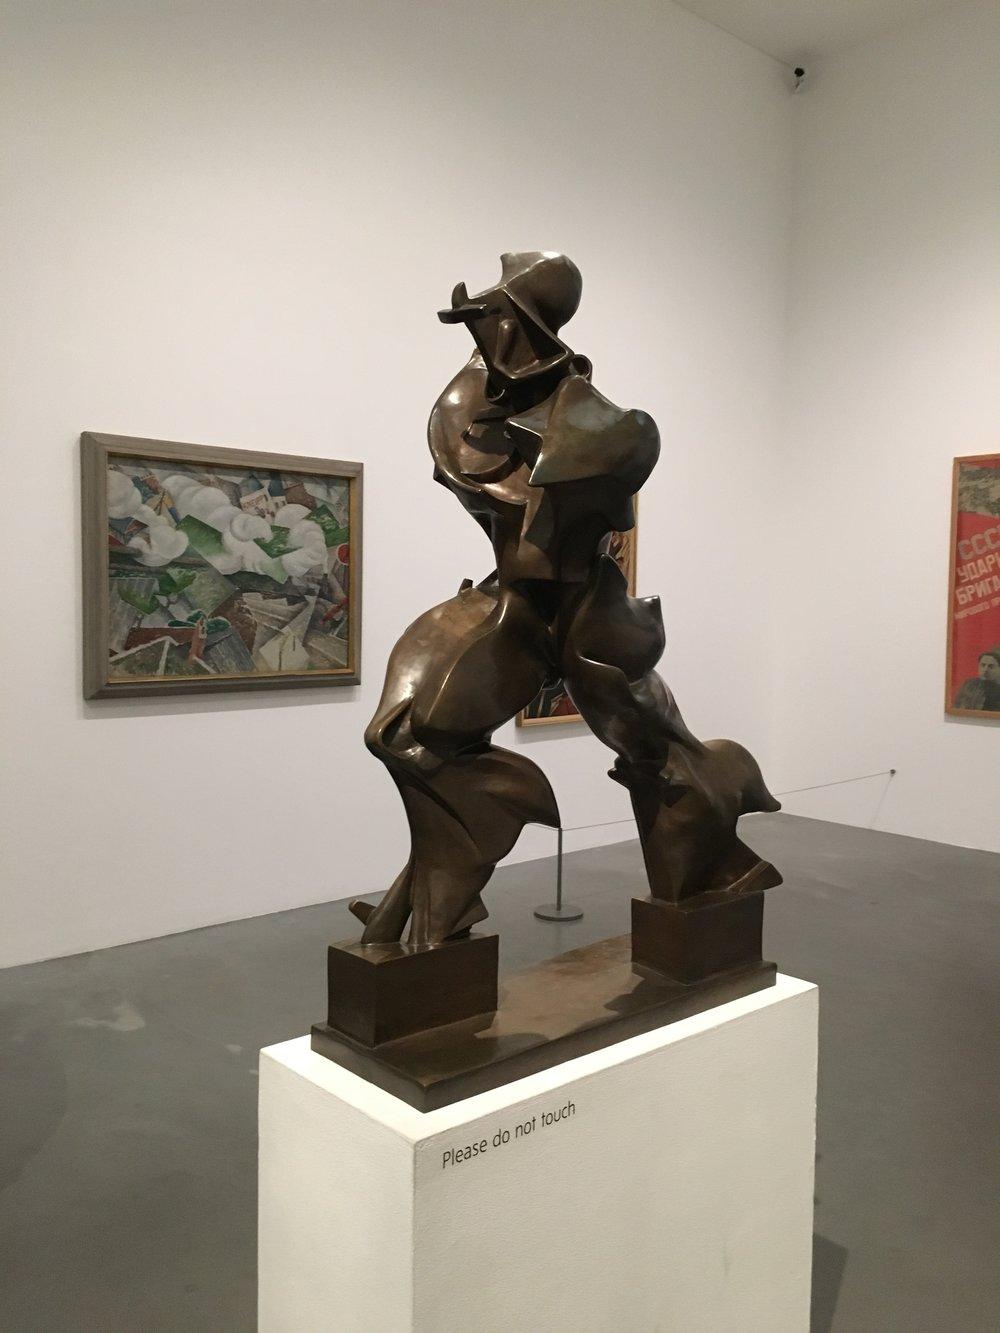 giacometti-sculpture-tate-modern